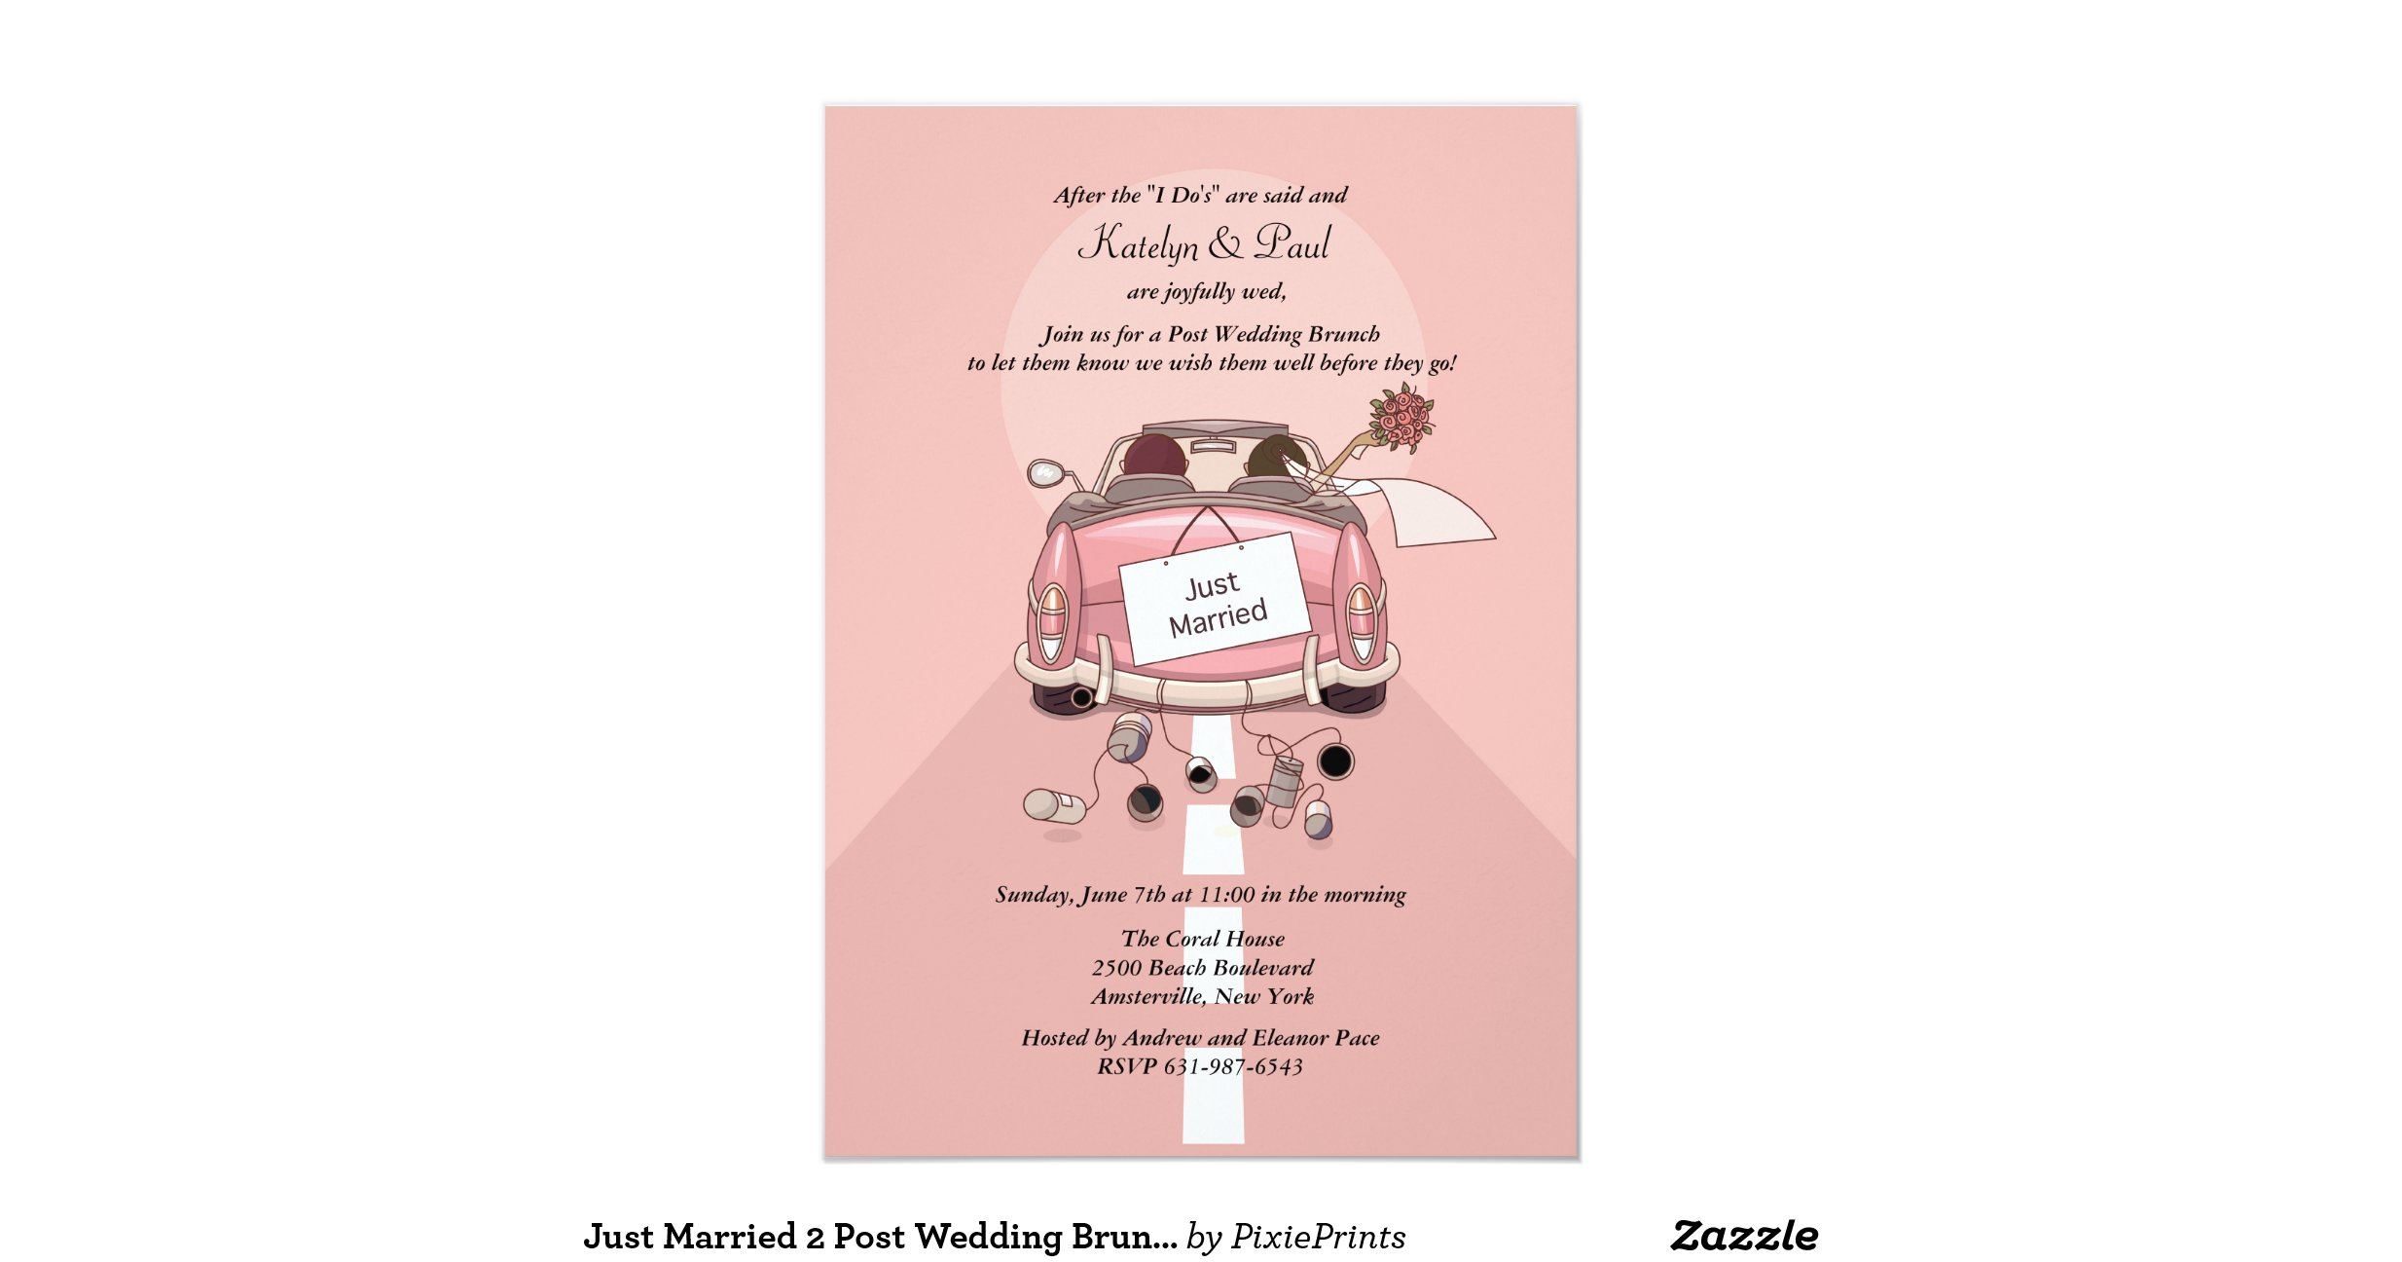 Post Wedding Brunch Invitation Wording: Just_married_2_post_wedding_brunch_invitation